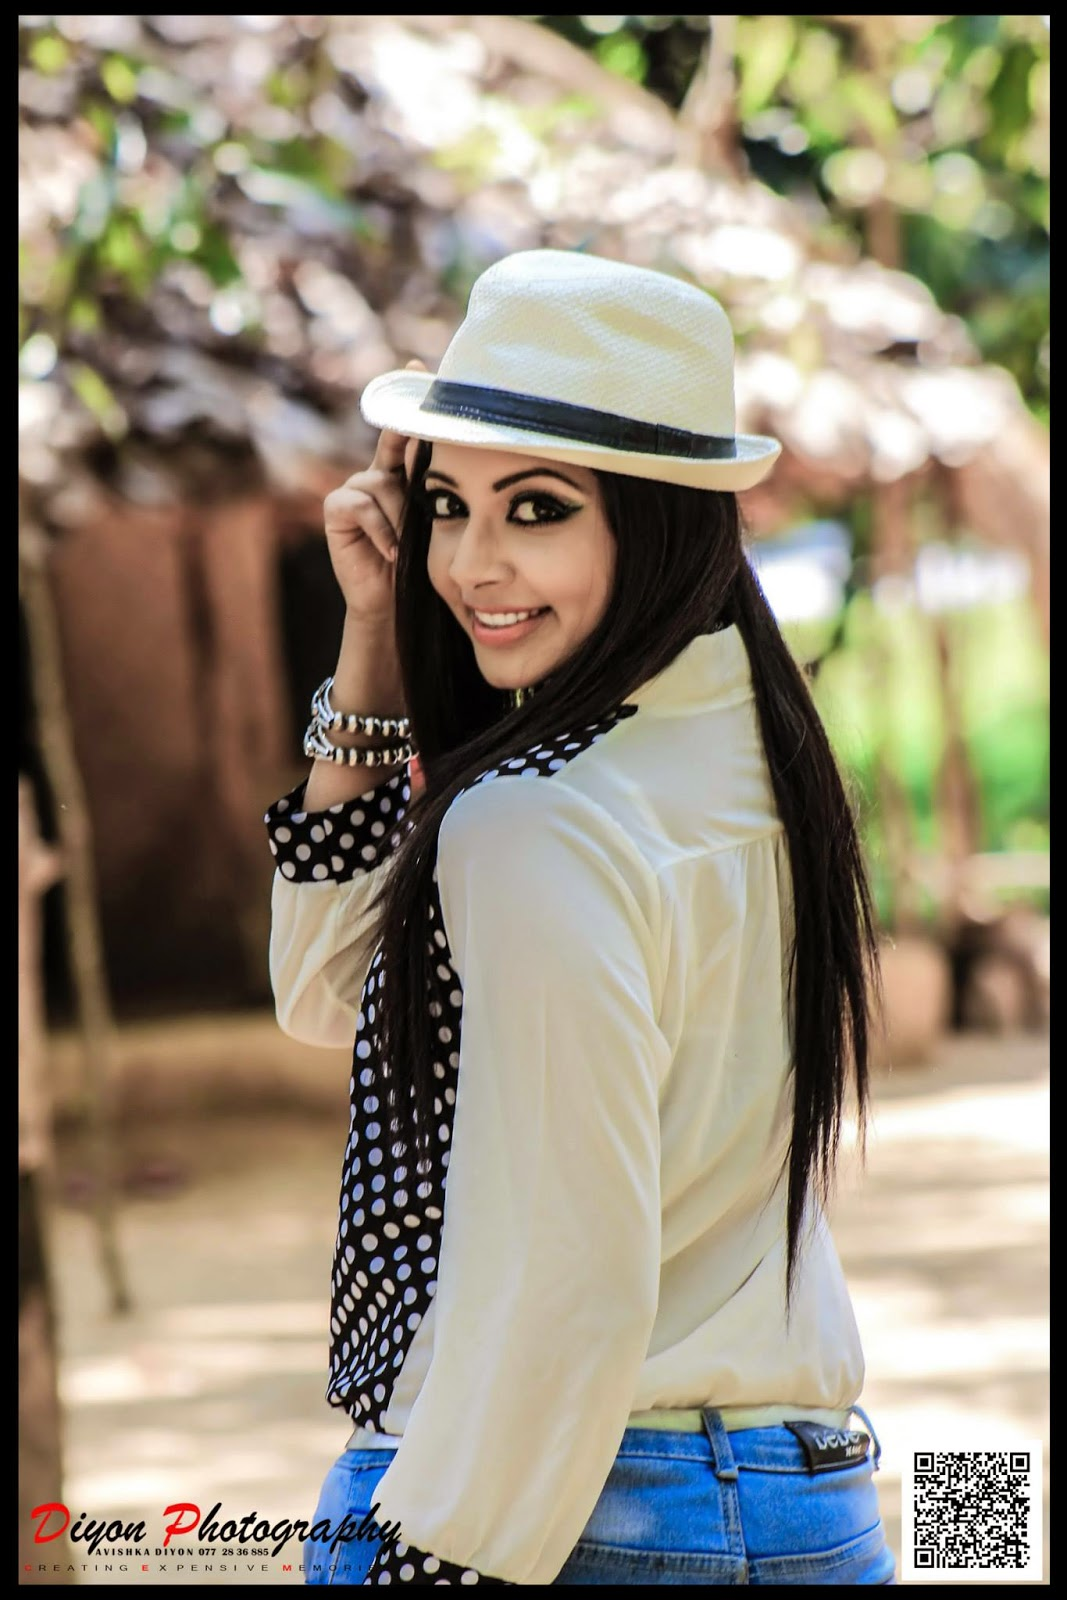 SRI LANKAN TASTE Fashion Magazine: Sexy Sri Lankan Model